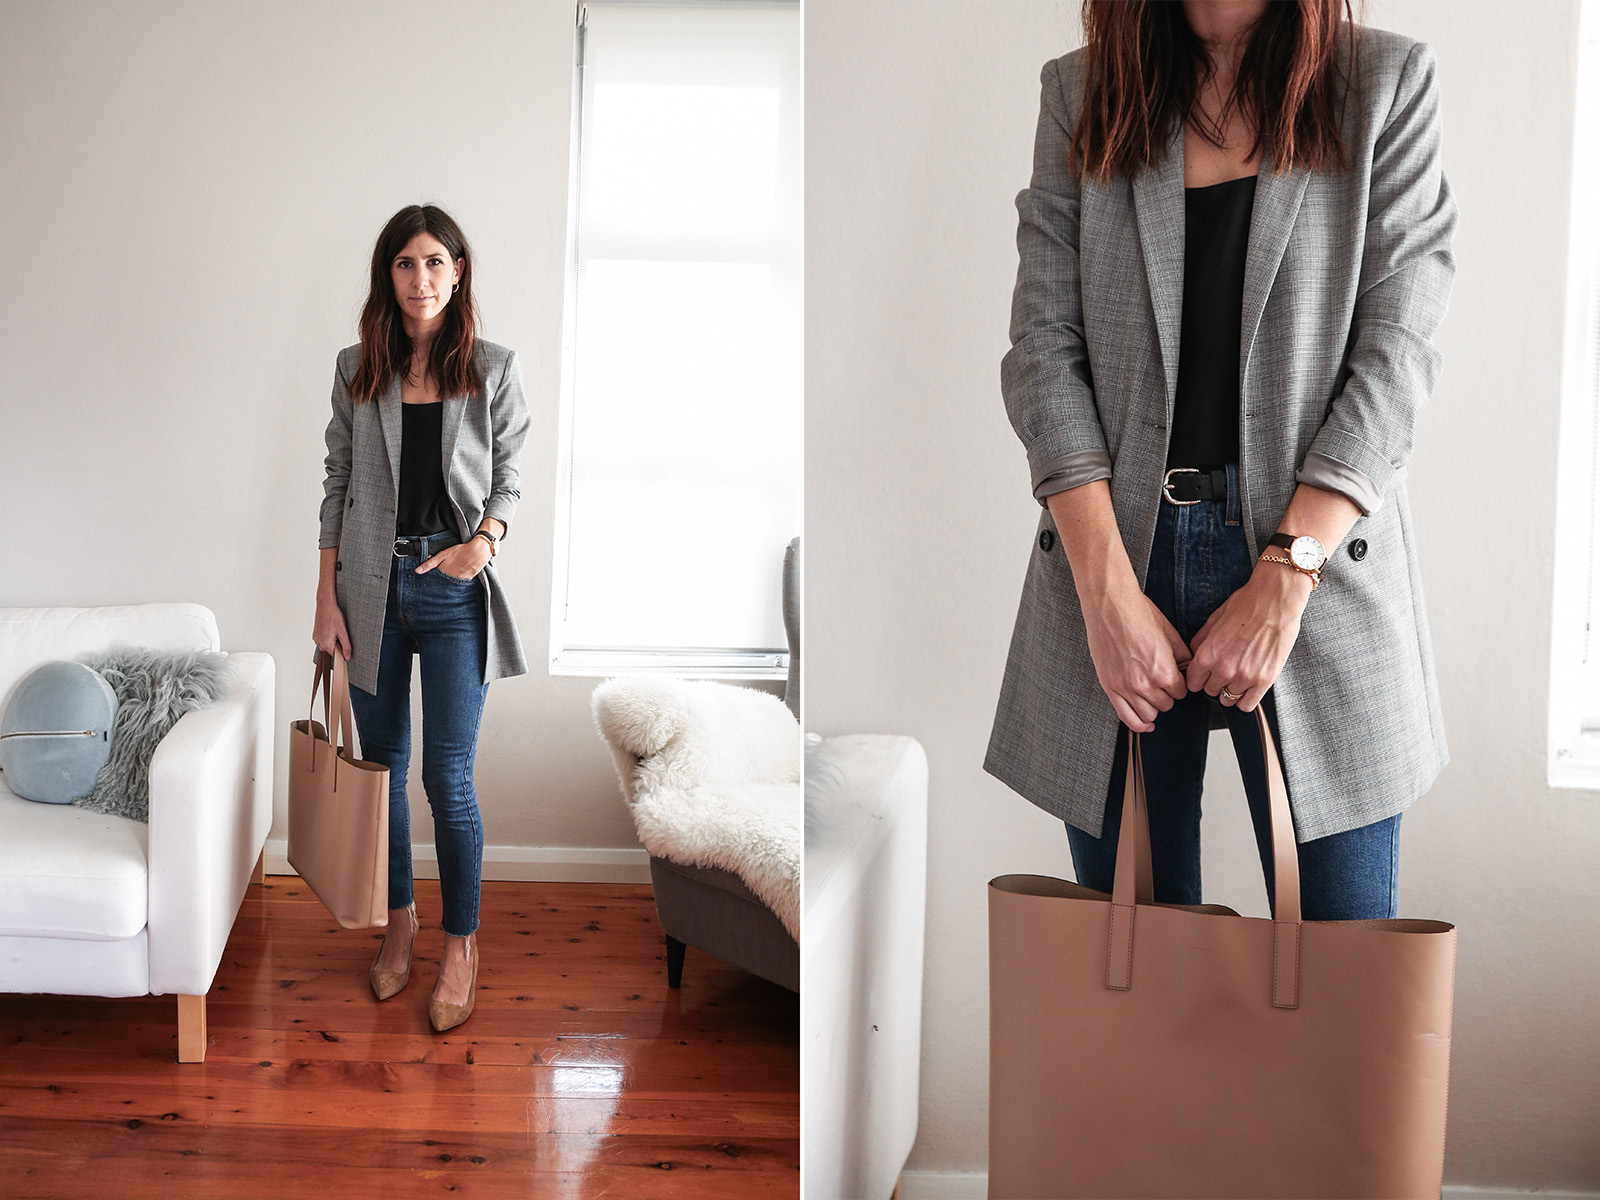 autumn wardrobe 10x10 challenge outfits